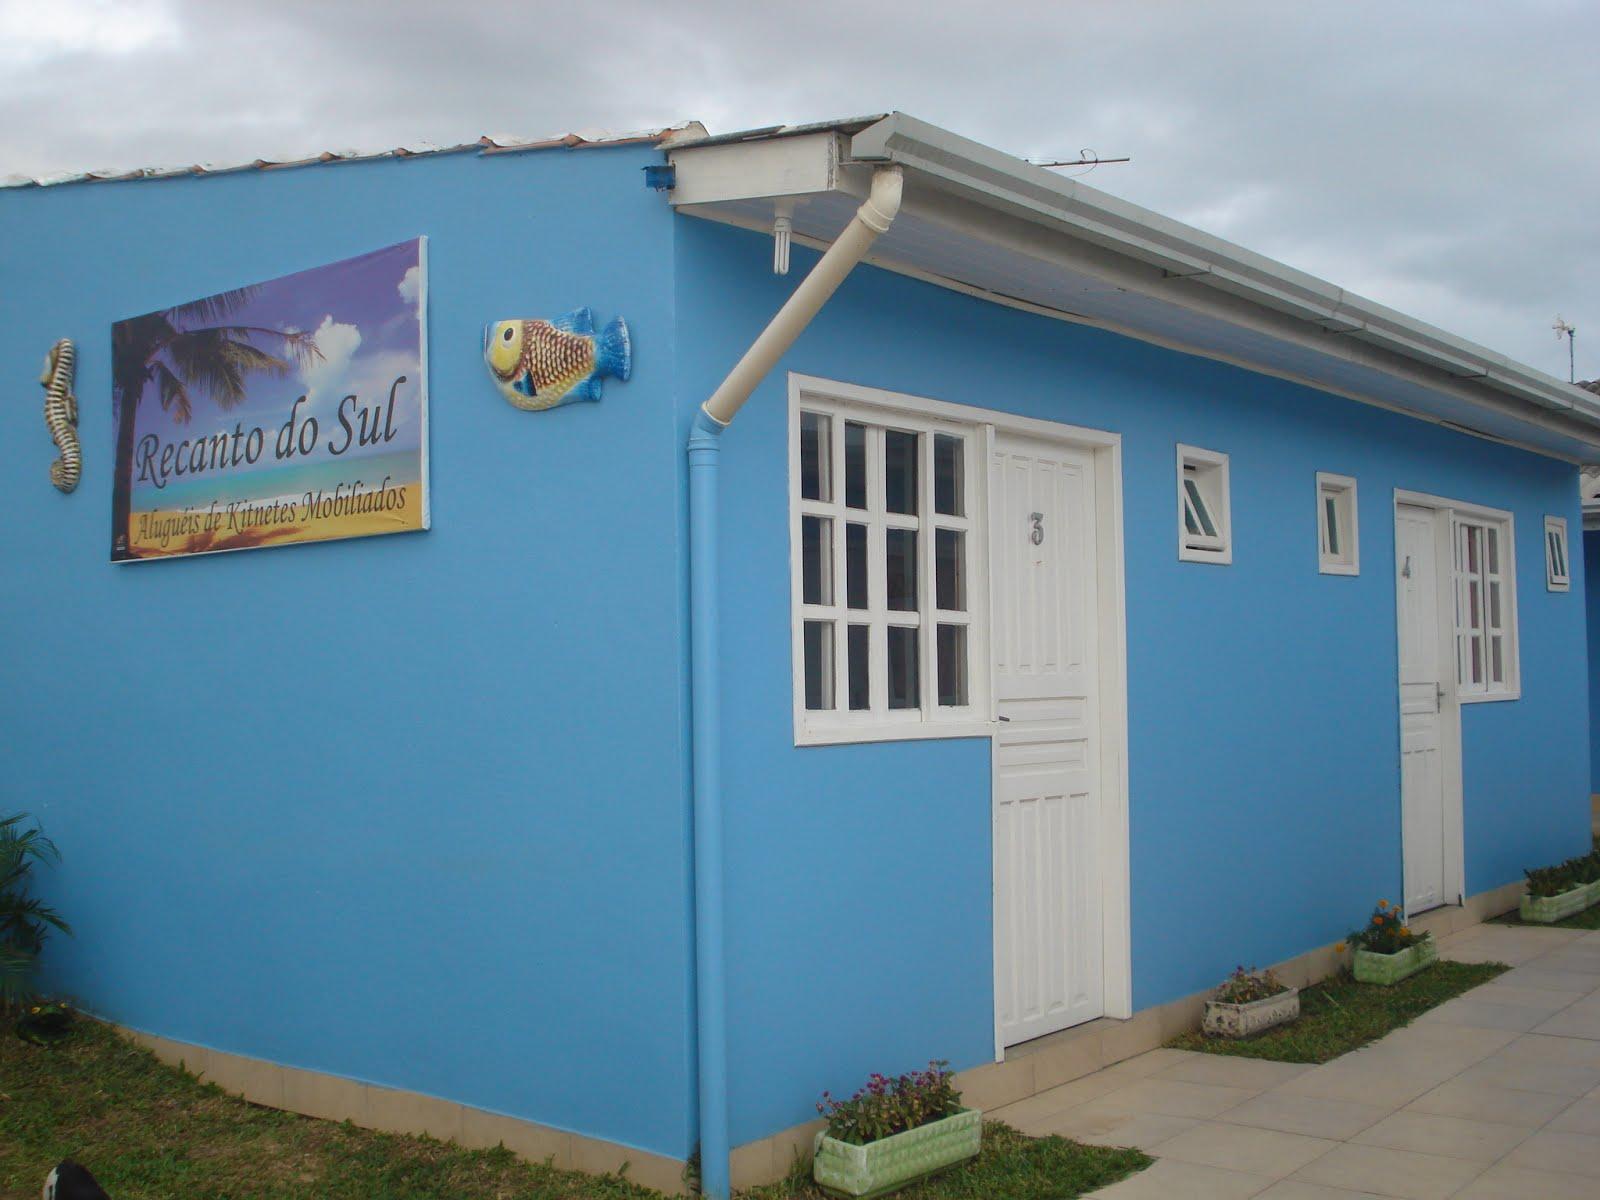 Rua Manoel José Luiz, 630, Zona Nova Sul - Tramandaí/RS